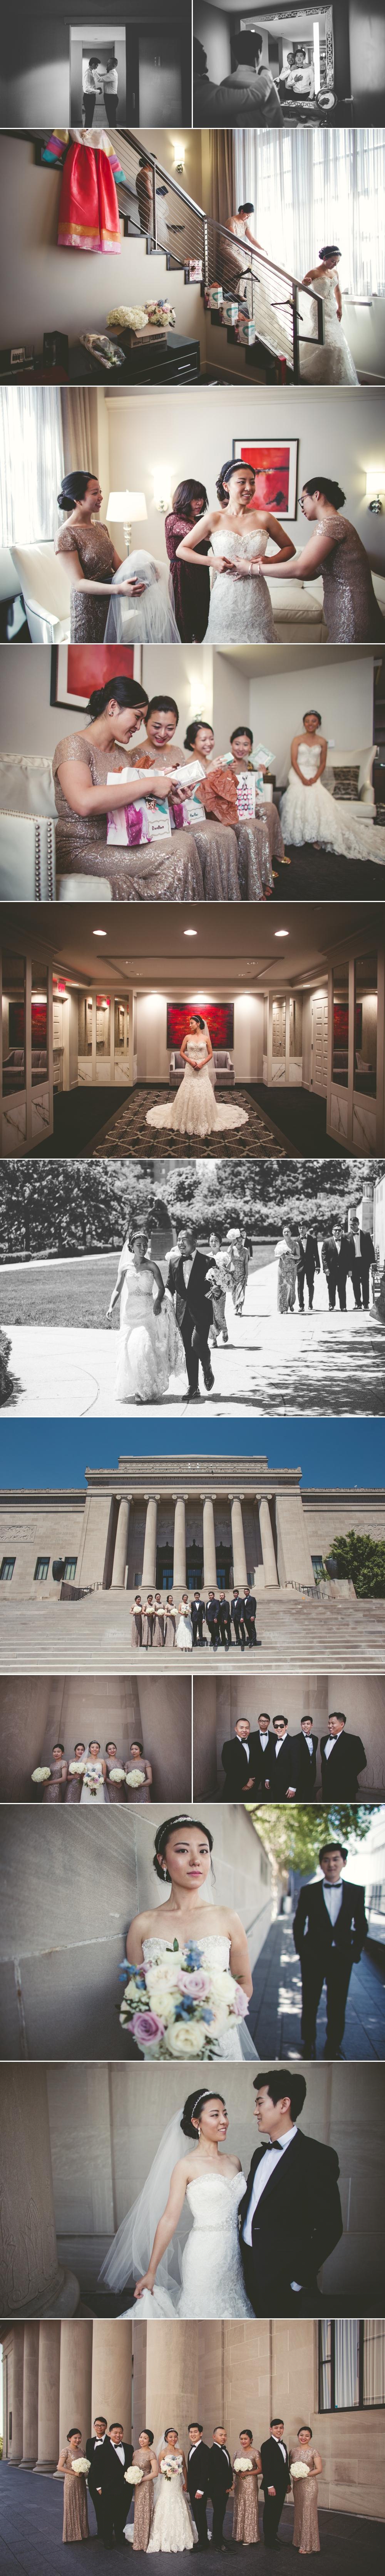 jason_domingues_photography_best_kansas_city_wedding_photographer_kc_weddings_korean_tea_ceremony_mark_twain_ballroom_00022.jpg